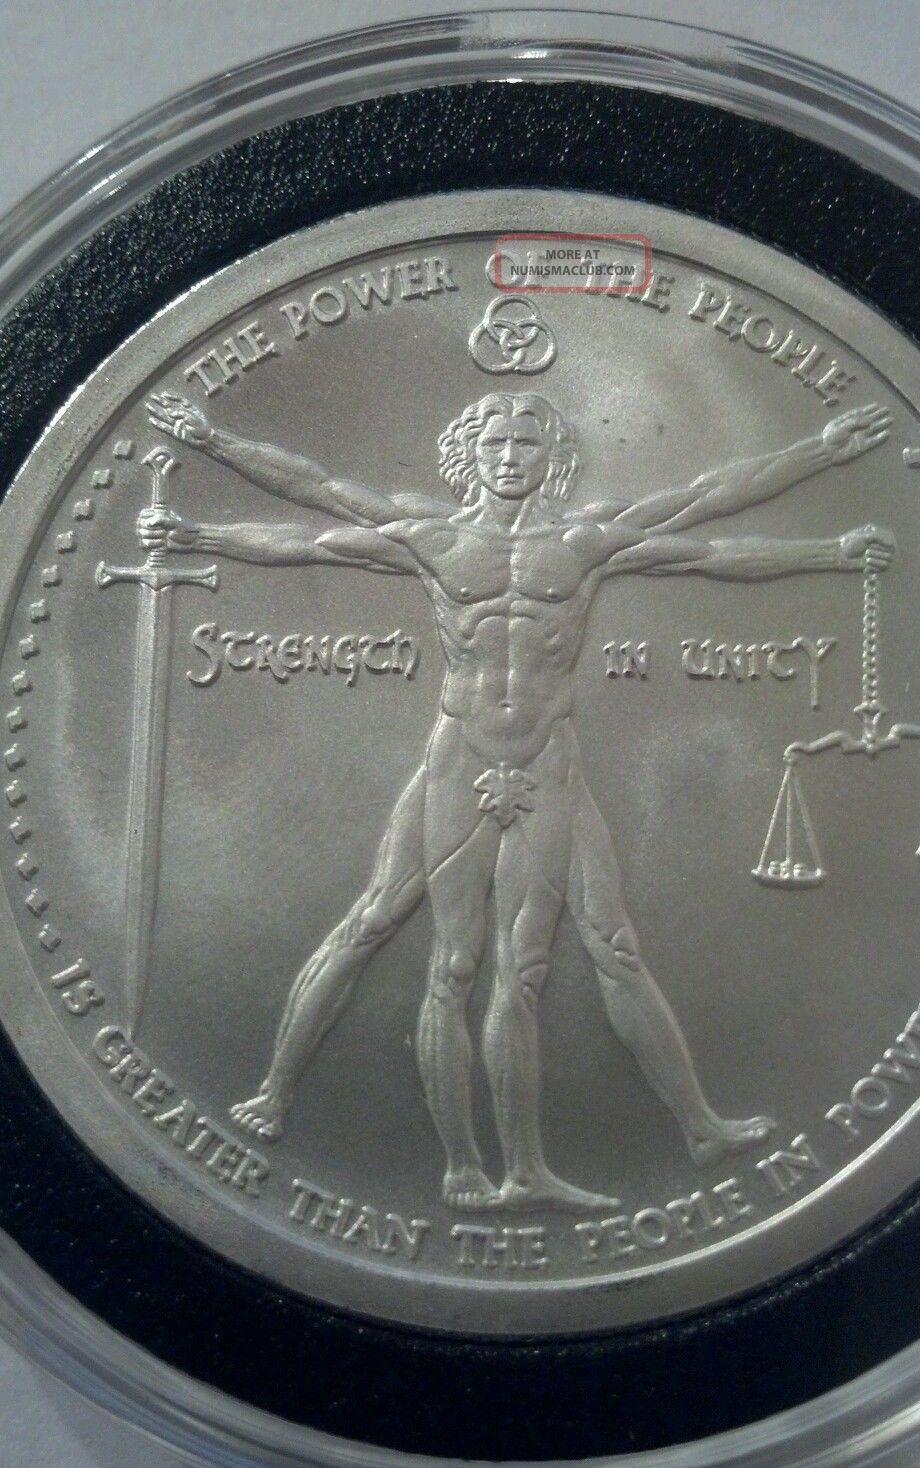 1 Oz 999 Silver Vitruvian Man Coin 2nd In Deluminati